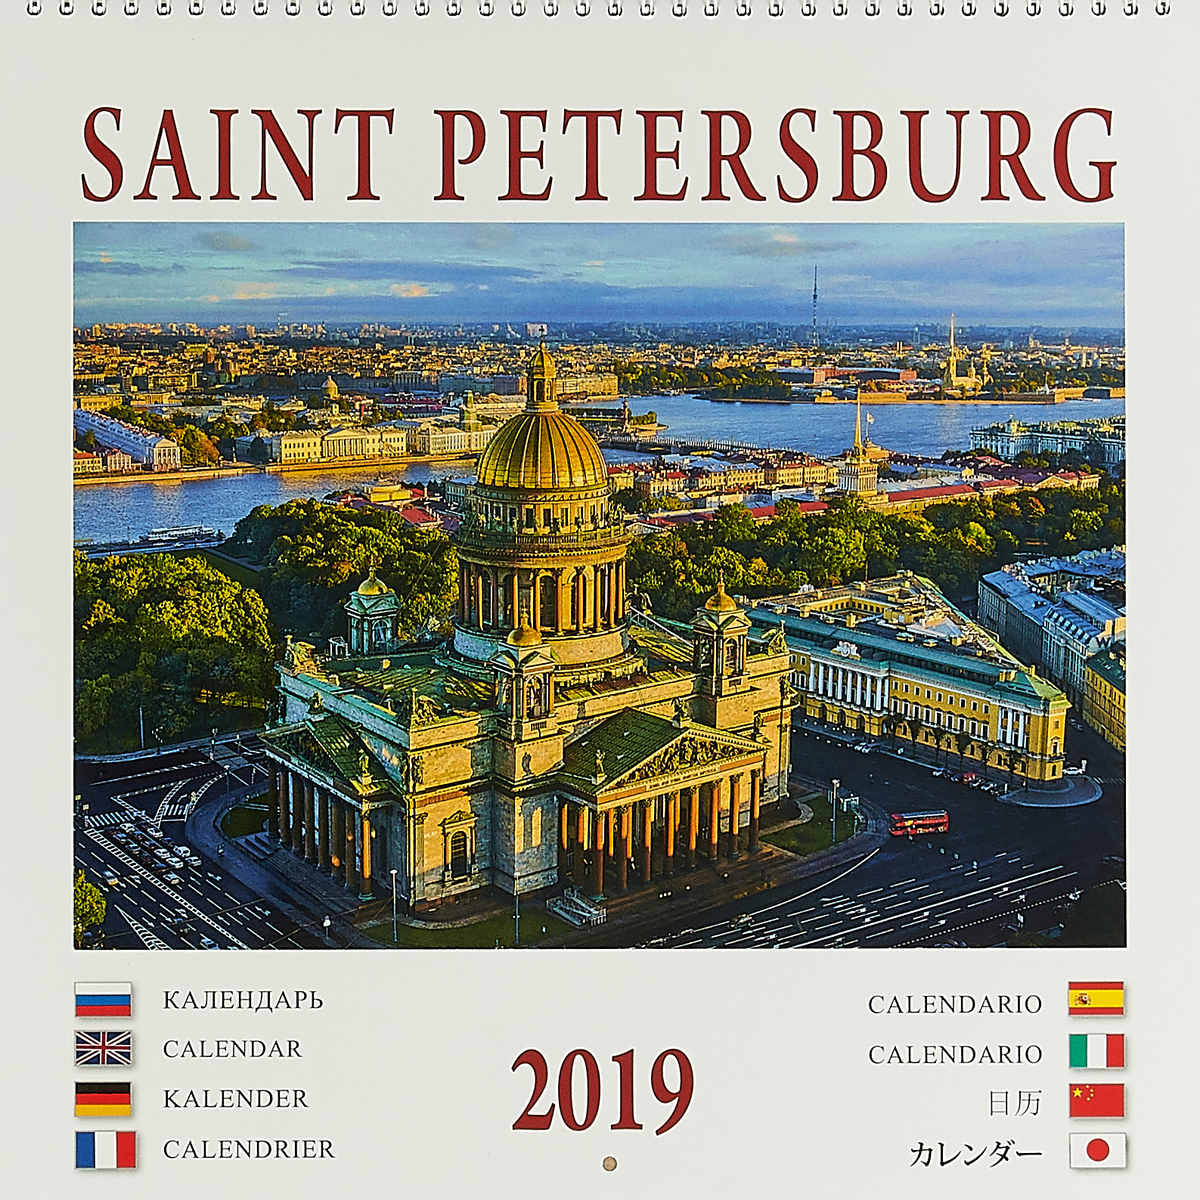 Календарь на спирали на 2019 год. Санкт-Петербург календарь на спирали на 2019 год русь православная